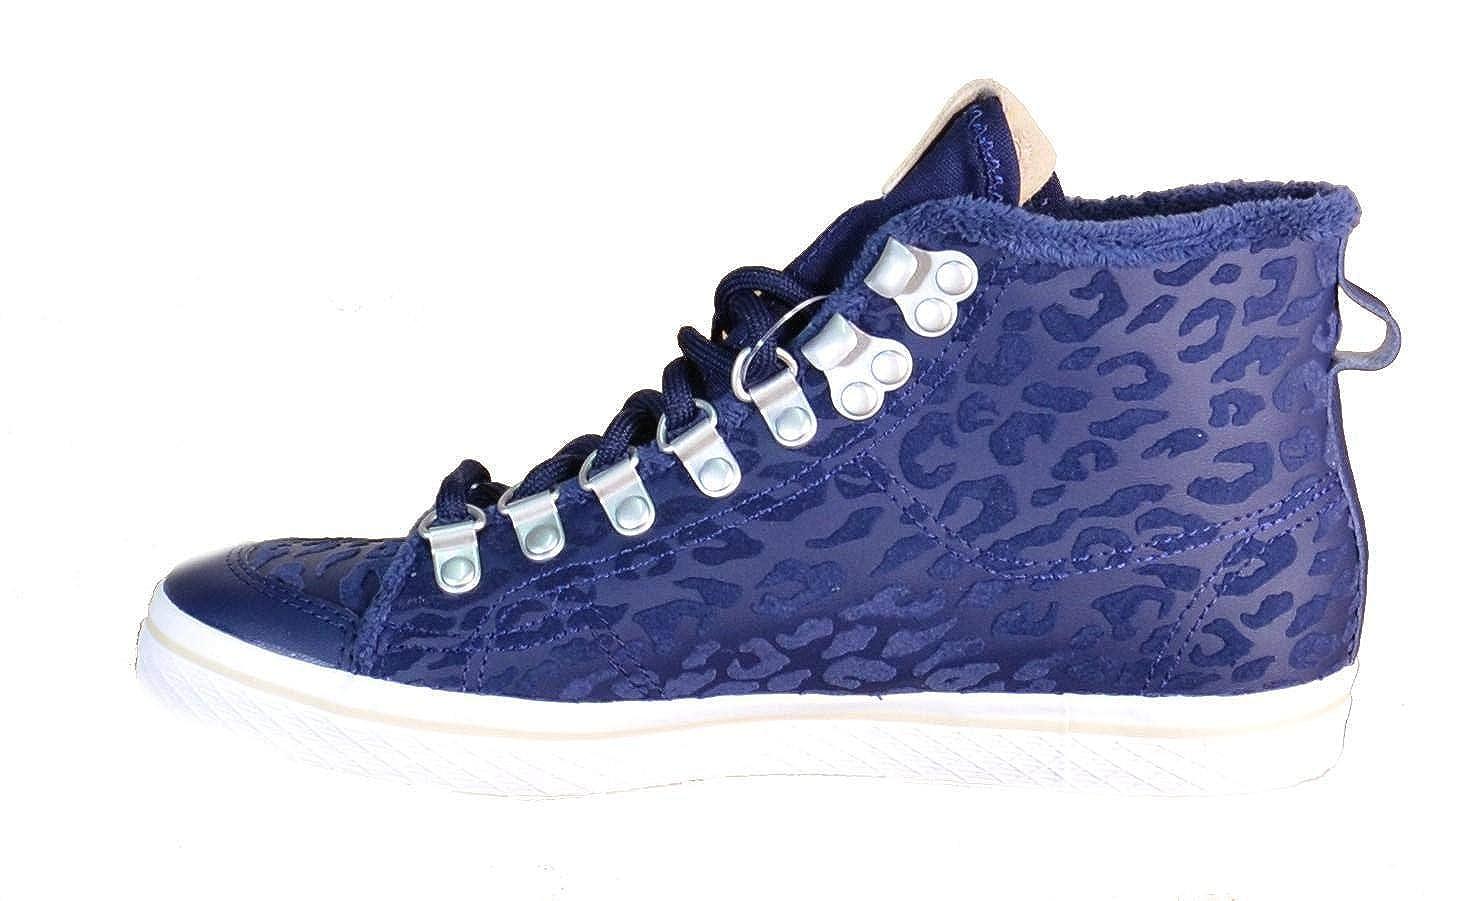 pretty nice bc602 d06d9 Adidas - Adidas Honey Hook W Scarpe Sportive Alte Donna Blu Pelle S77425 -  Blu, 38  Amazon.it  Scarpe e borse